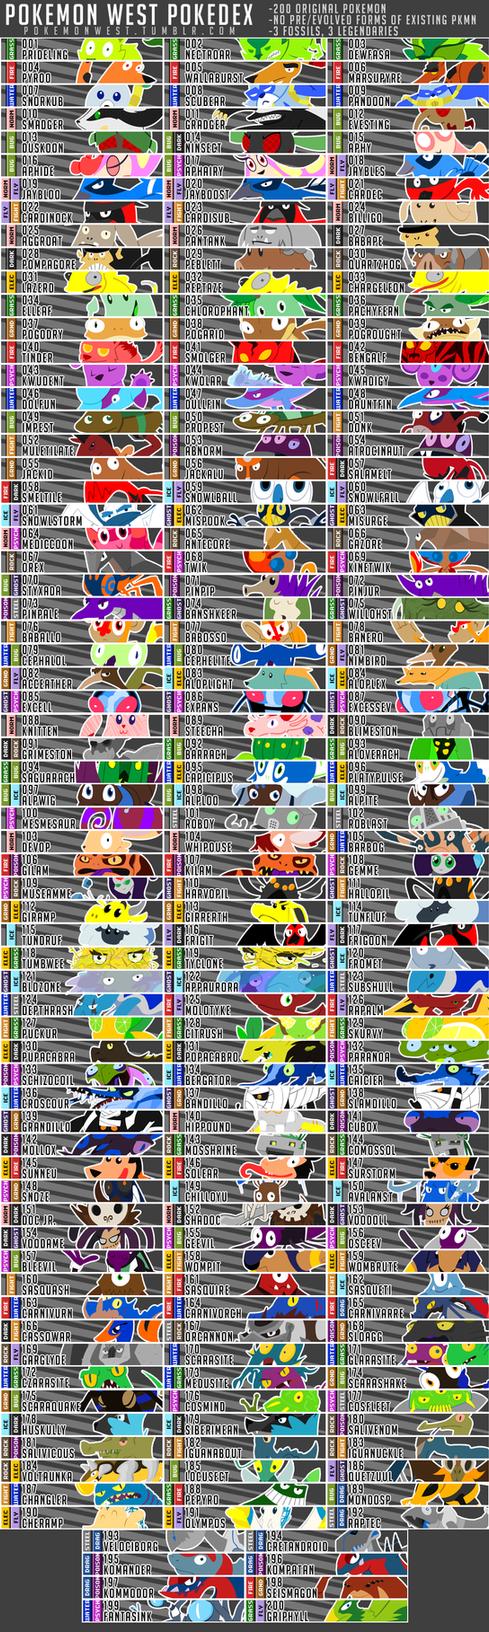 Pokemon West Pokedex COMPLETED by pokemonwest